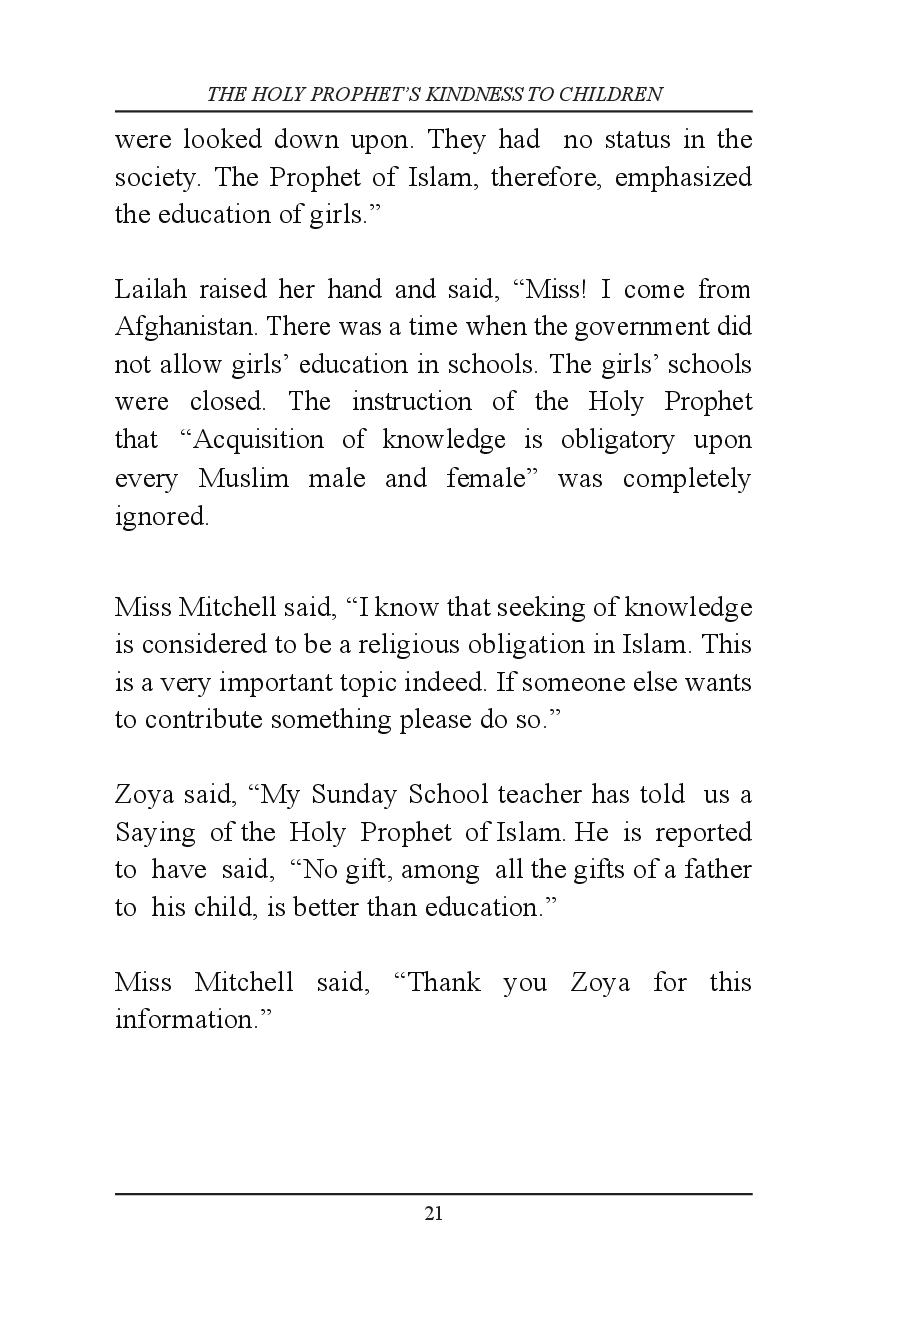 PDF: /library/books/KindnessToChildren pdf : 24